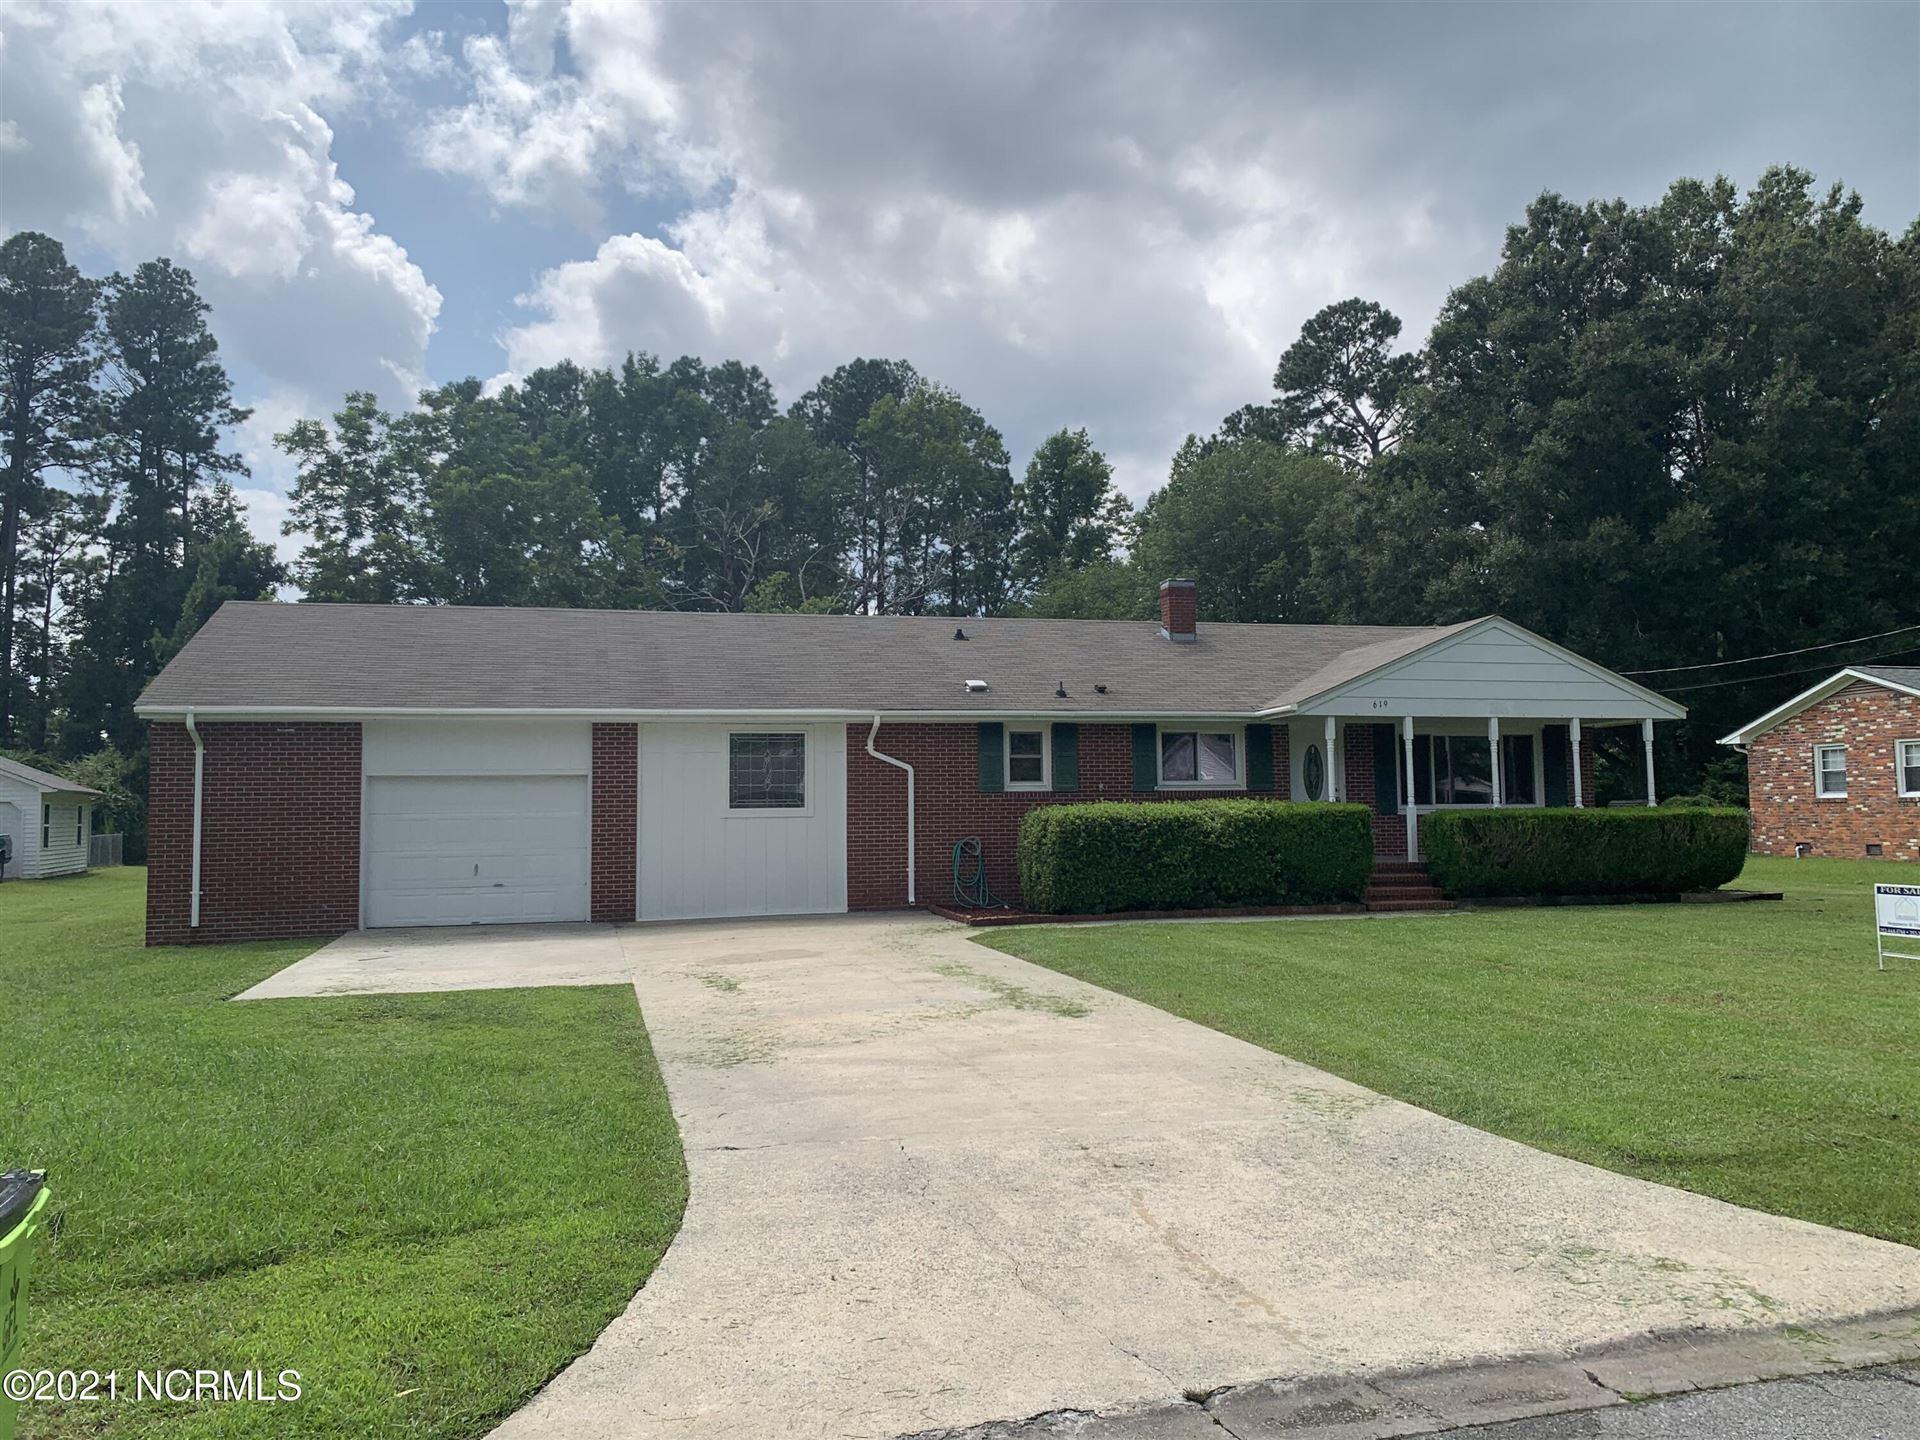 Photo of 619 Lee Drive, Havelock, NC 28532 (MLS # 100285379)